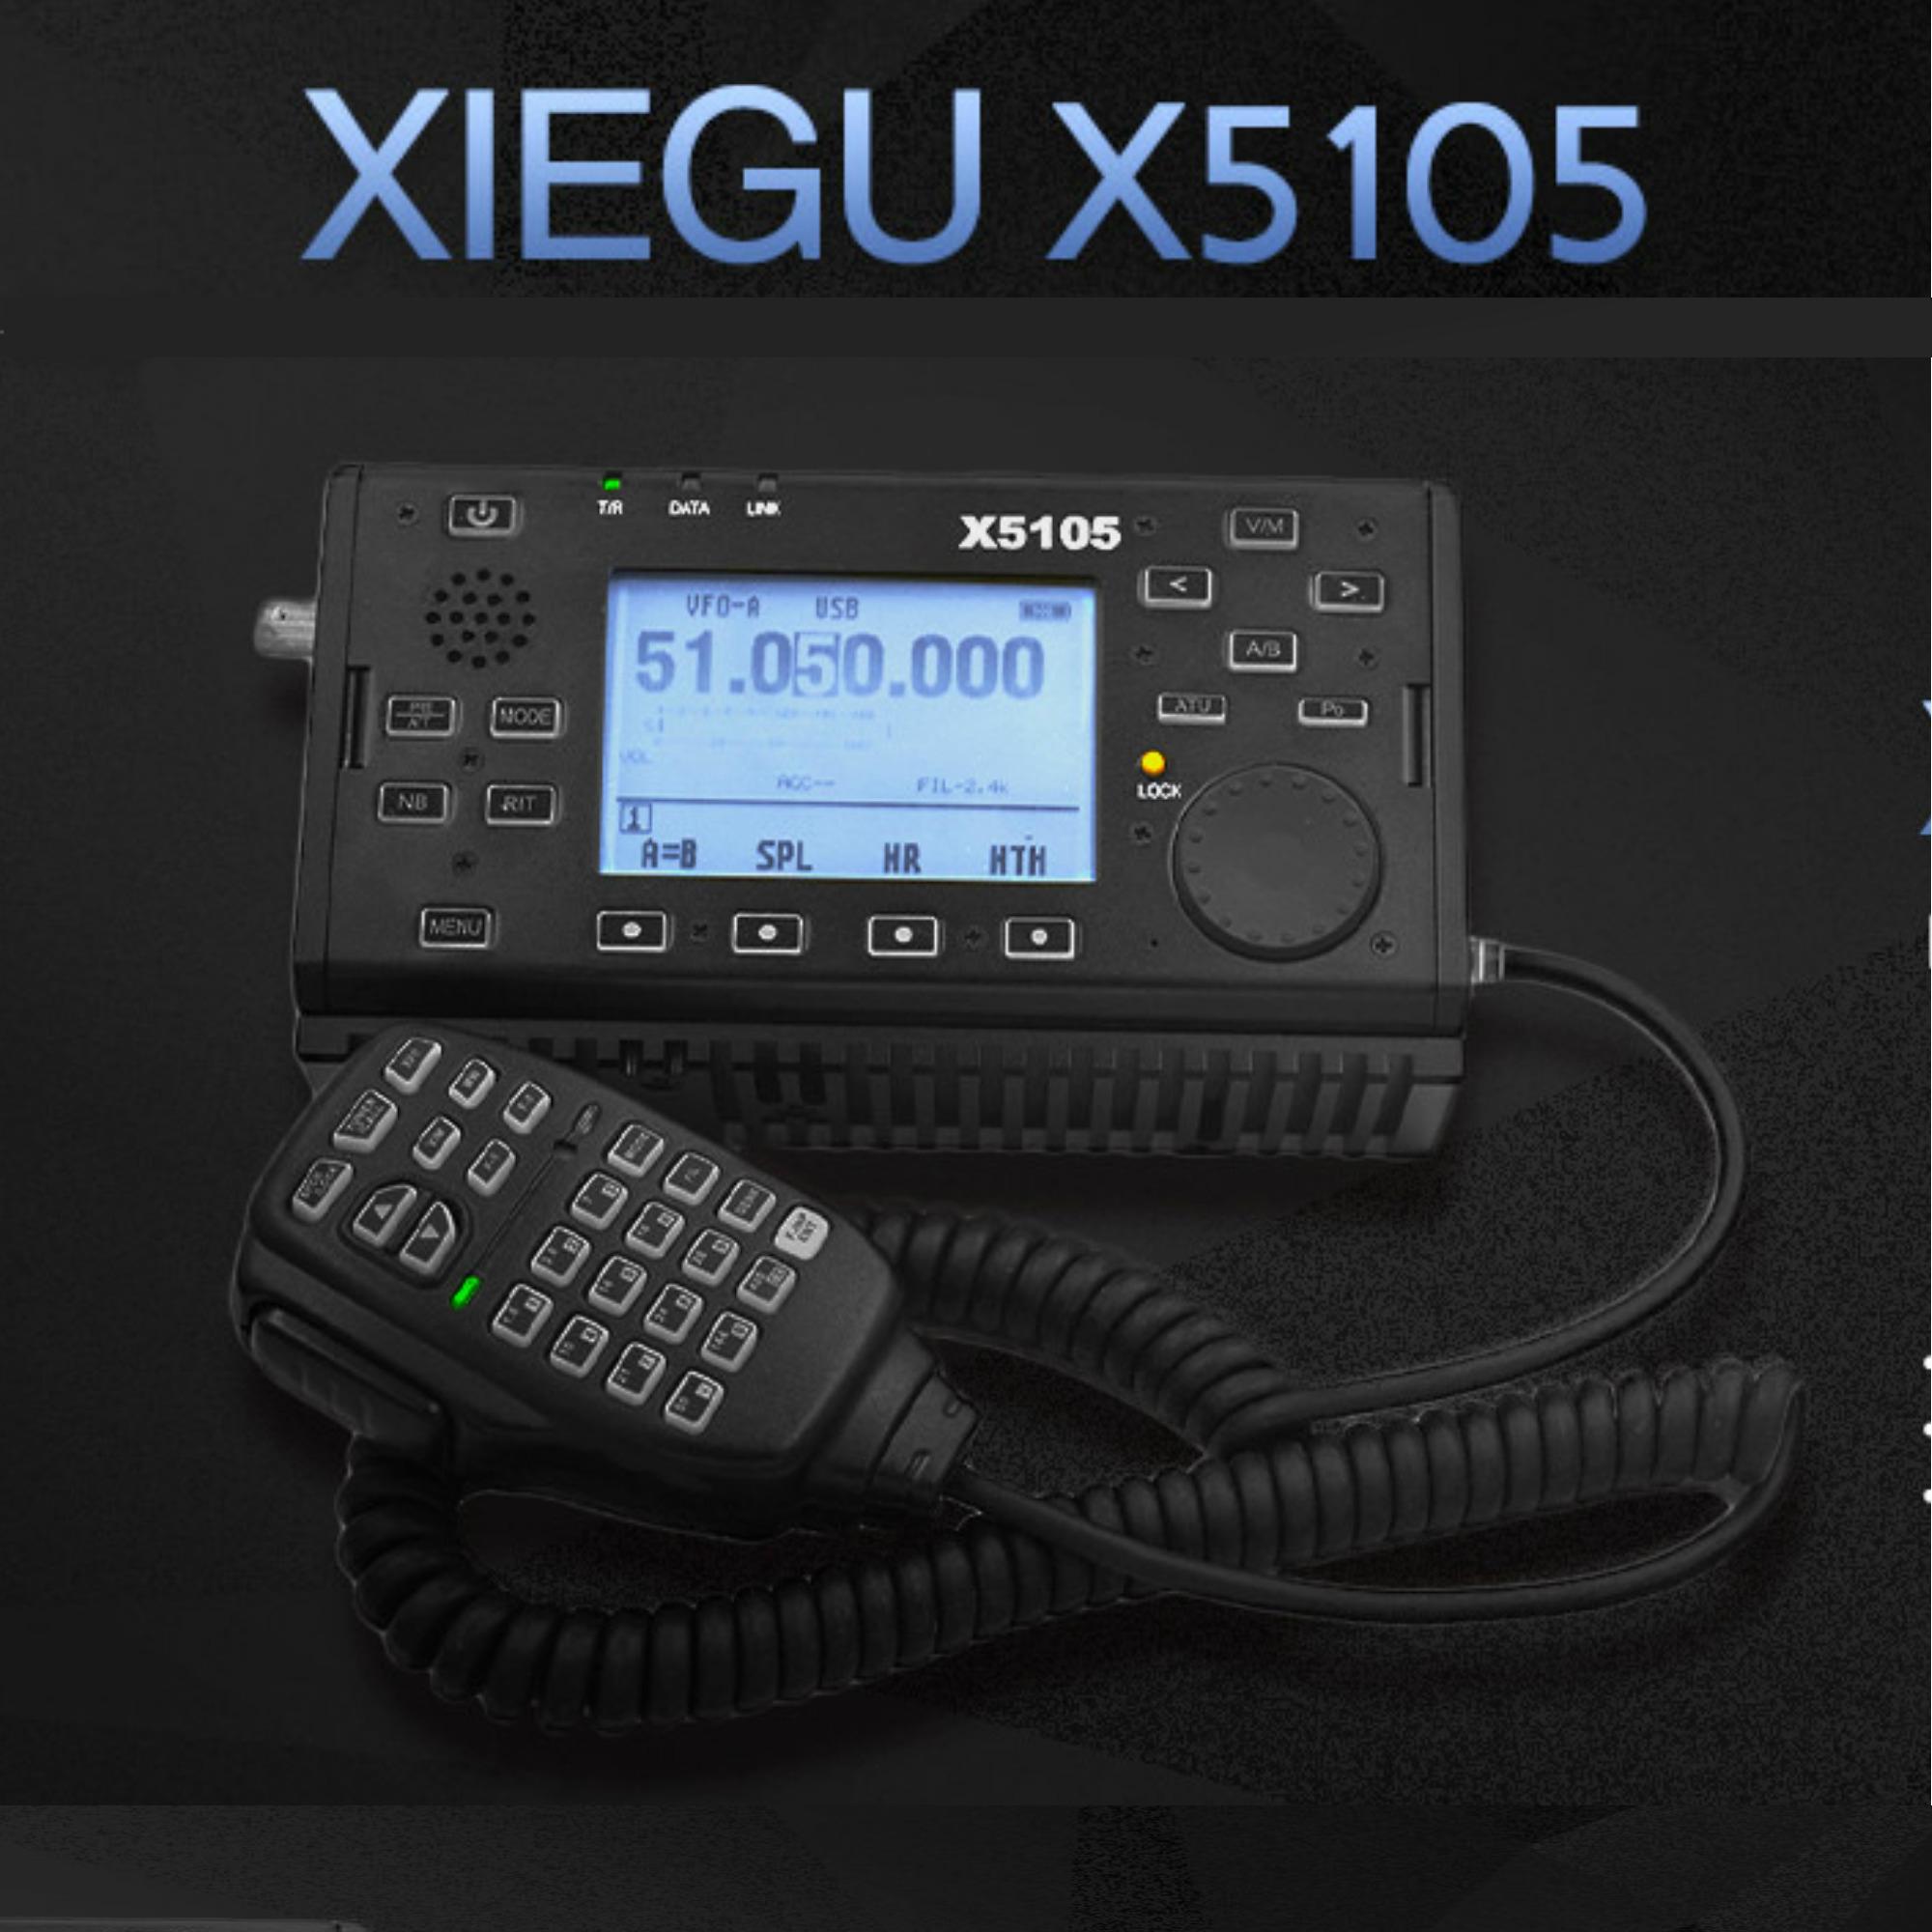 Xiegu USB X5105//G90 Sound Card Digimode Interface PSK31 WSJT-X etc FT8